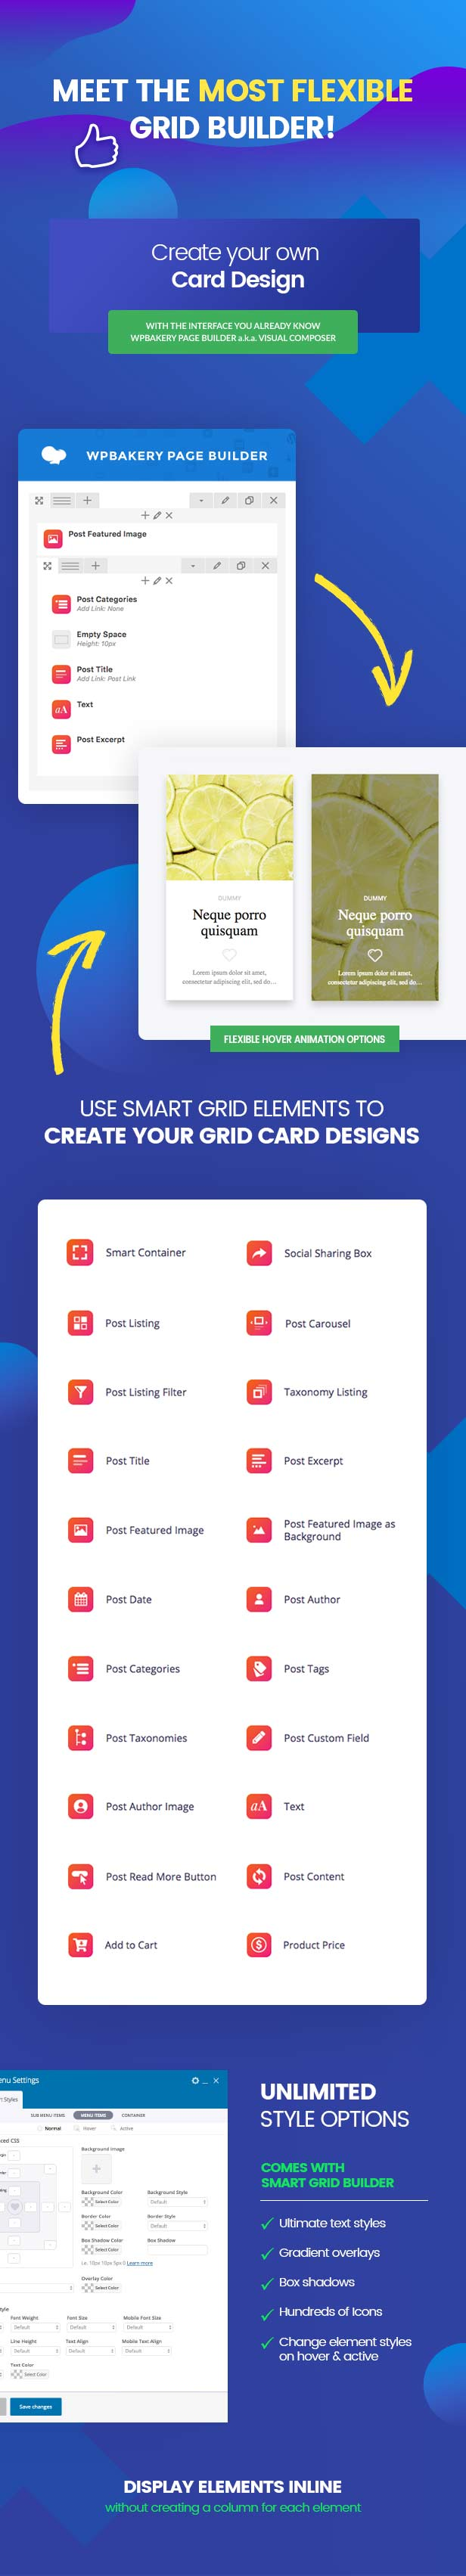 Smart Grid Builder - WPBakery Page Builder Add-on - 4